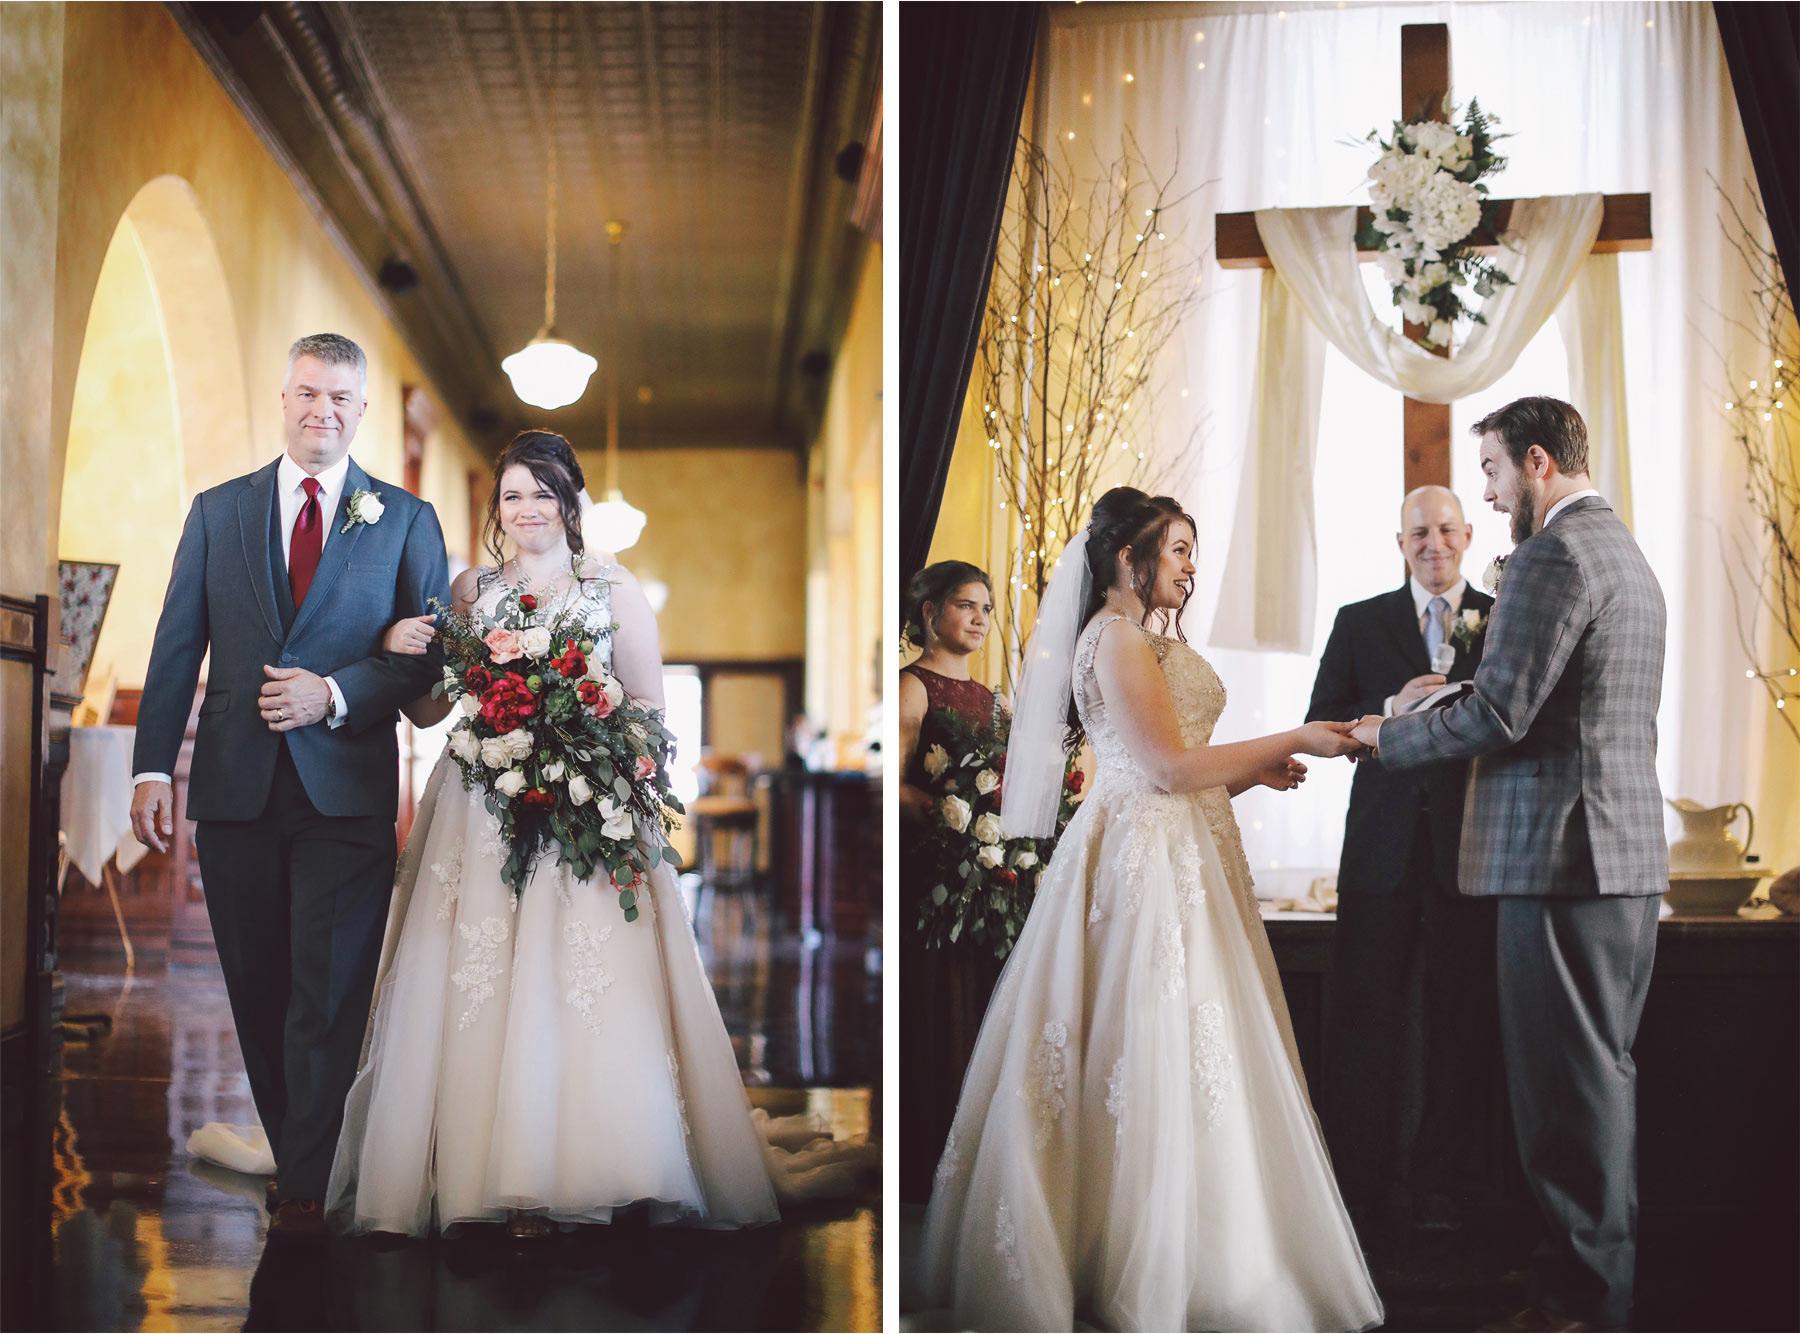 10-Minneapolis-Wedding-Photography-by-Vick-Photography-Historic-Concord-Exchange-Ceremony-Rachael-and-Benjamin.jpg